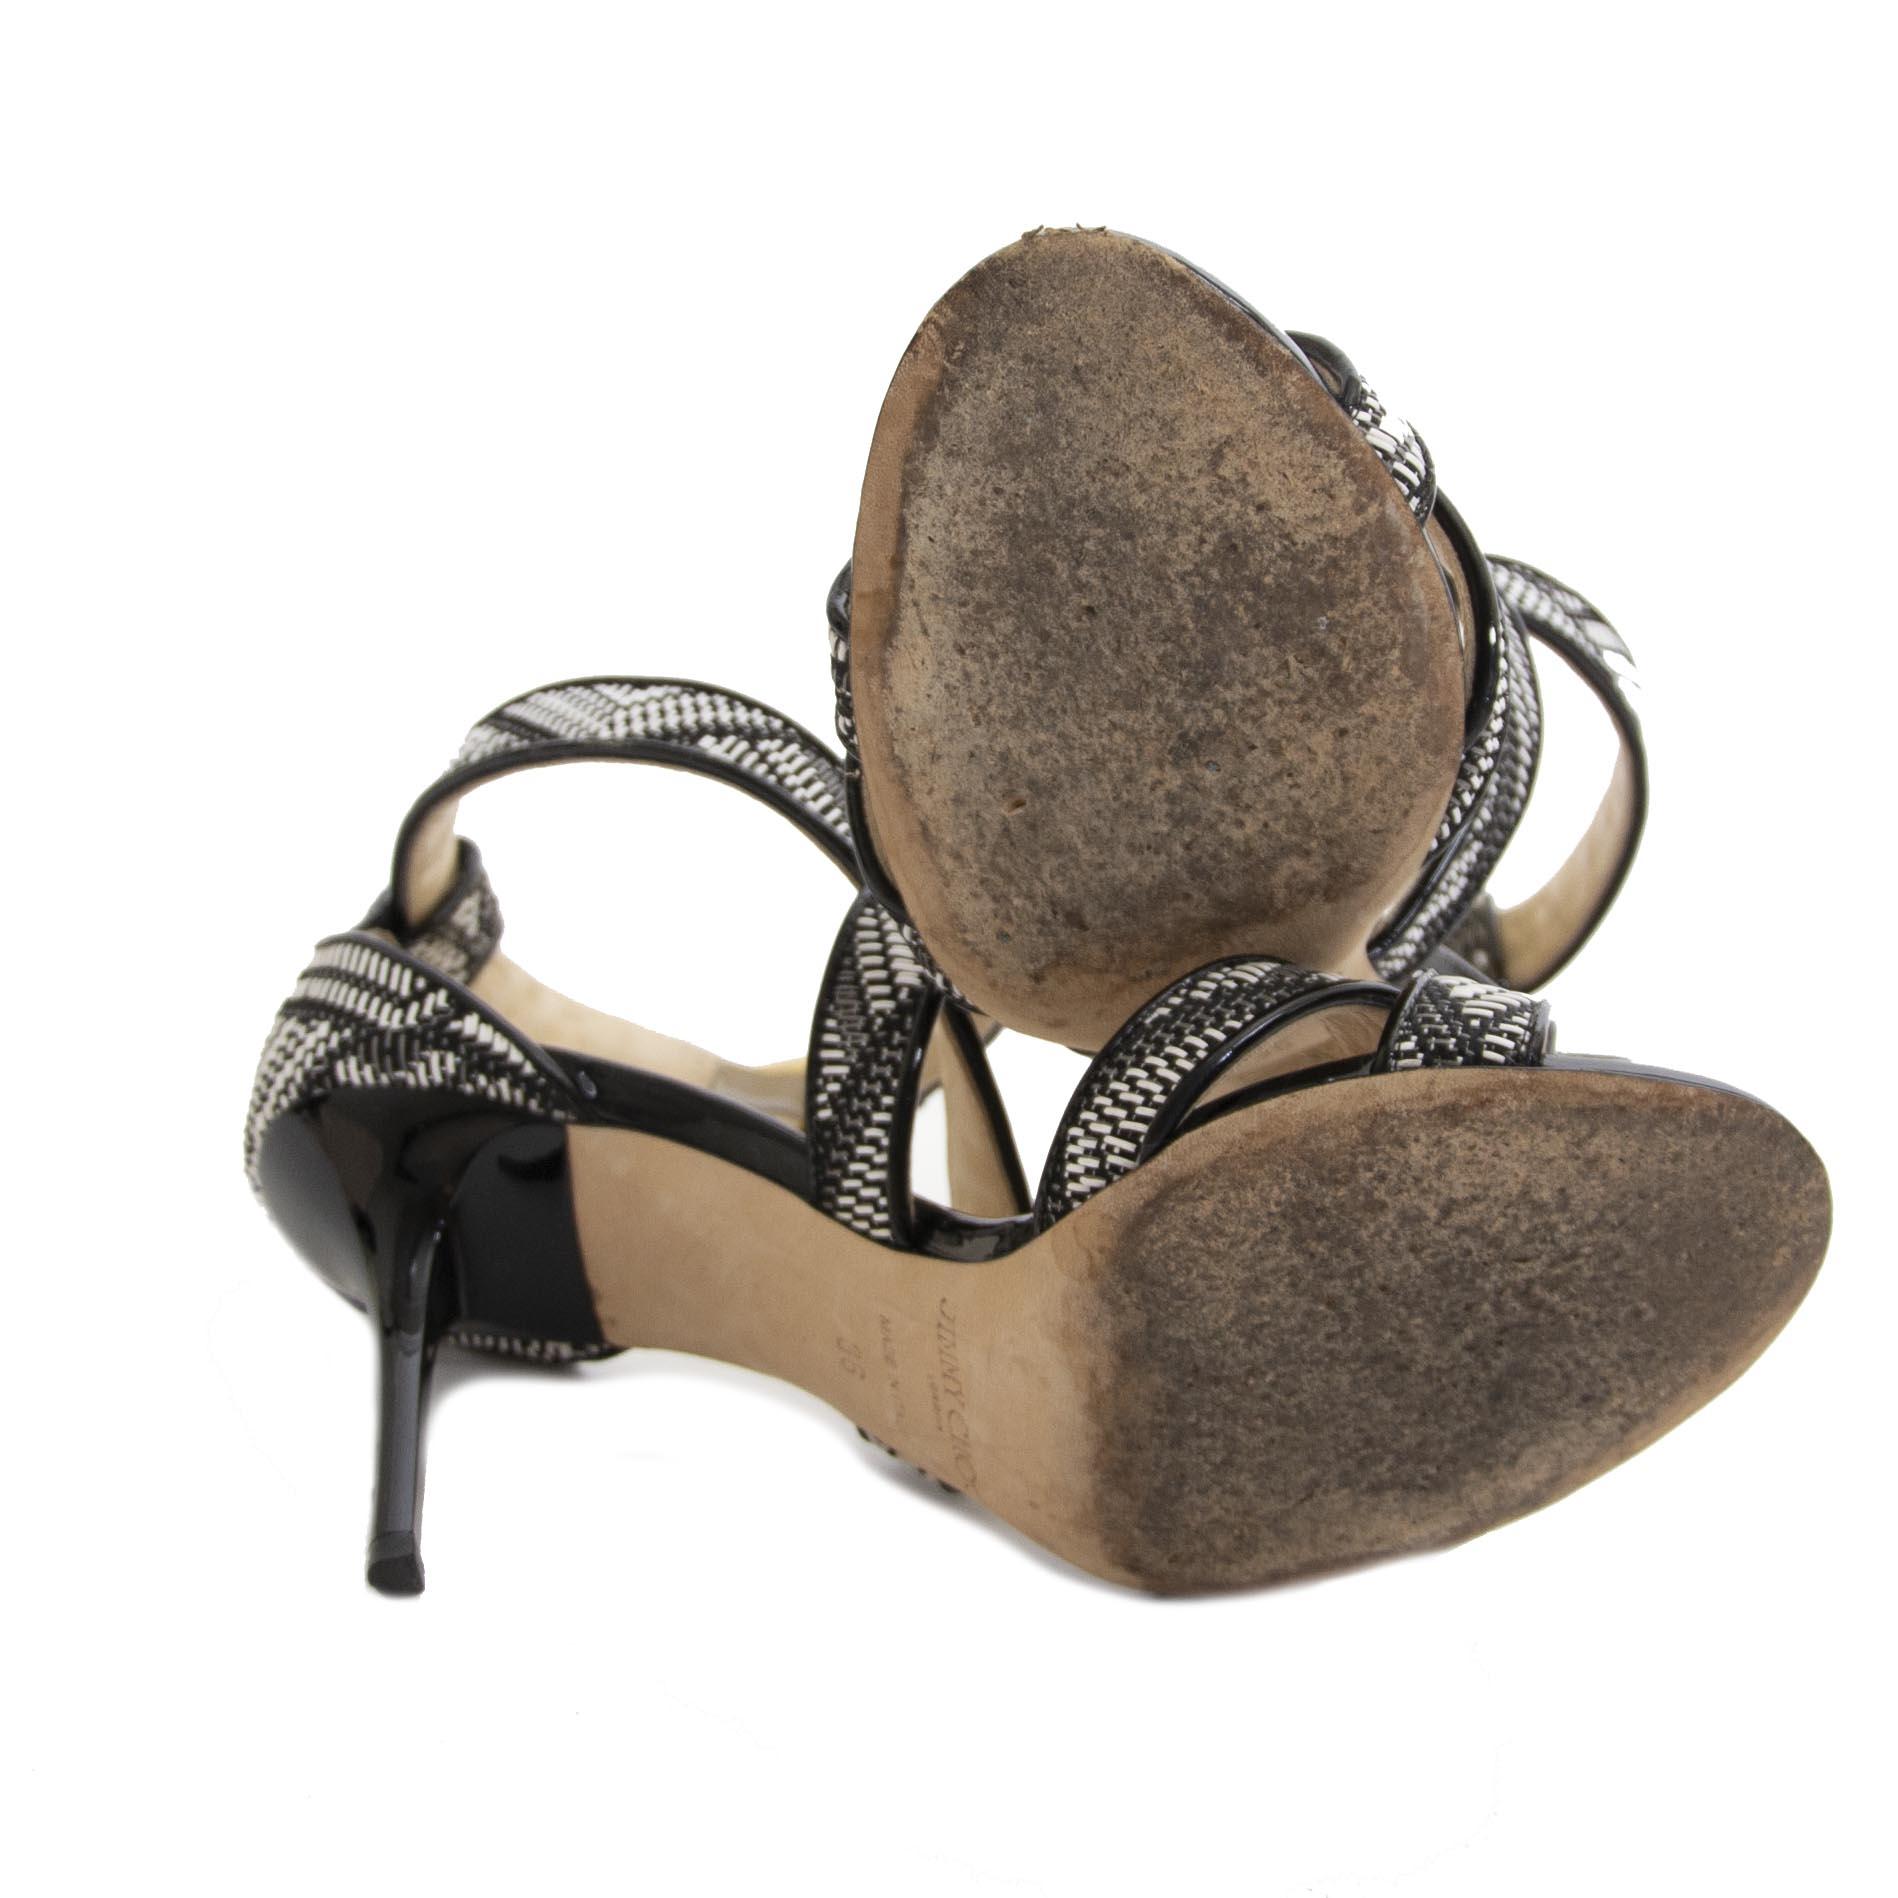 Jimmy Choo Braided Black & White Sandals te koop aan de beste prijs bij Labellov